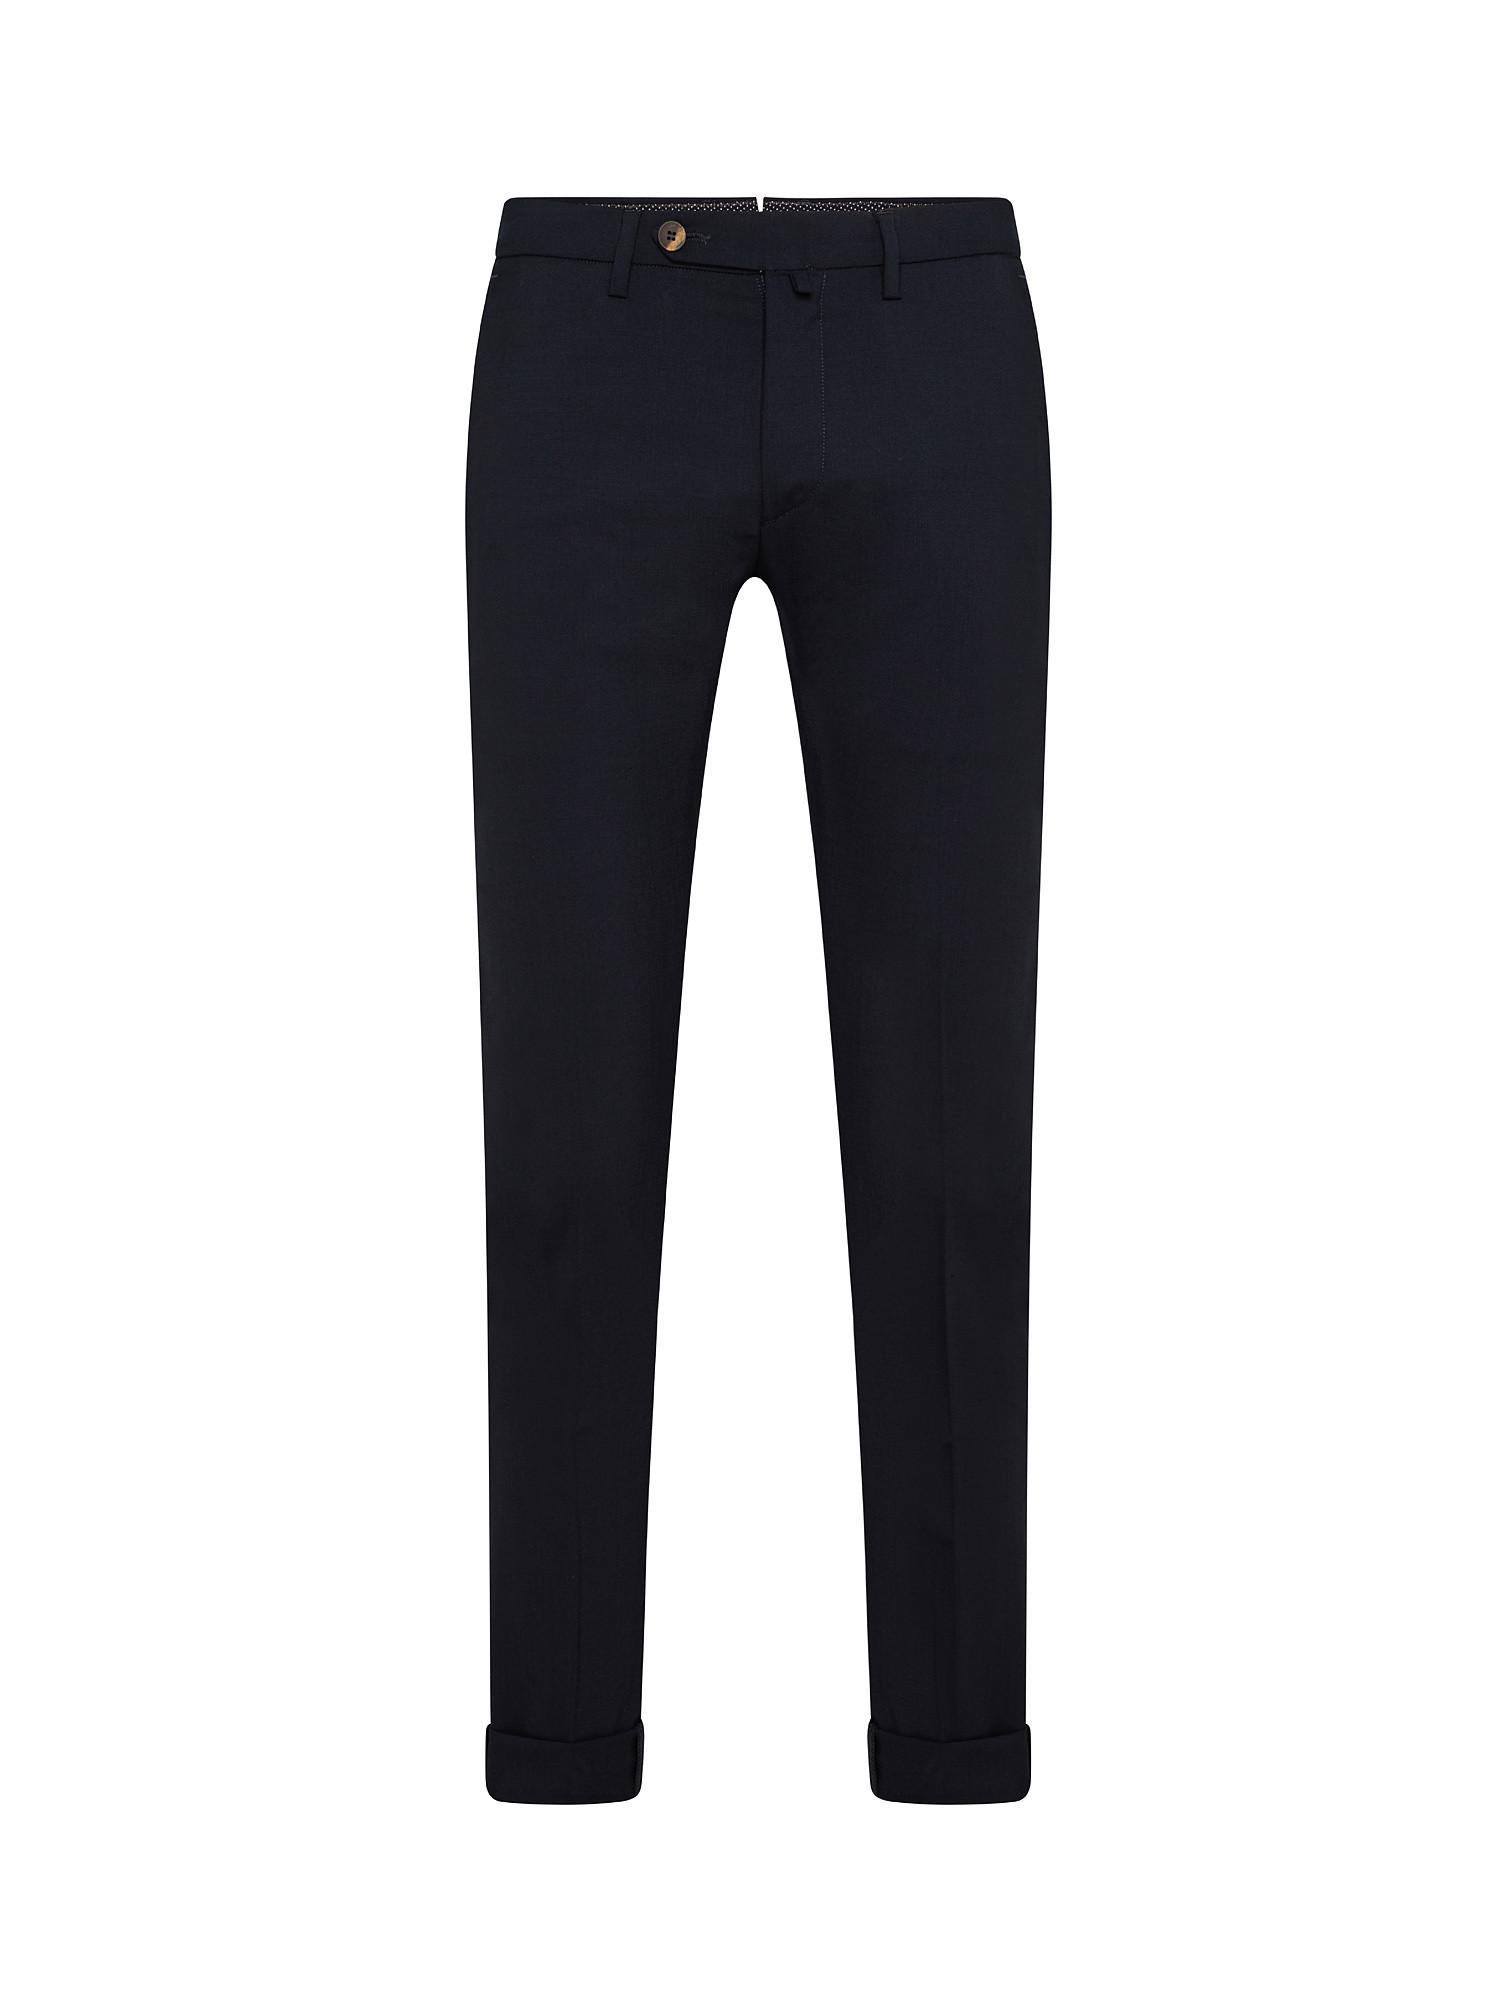 Pantalone chino misto lana, Blu scuro, large image number 0